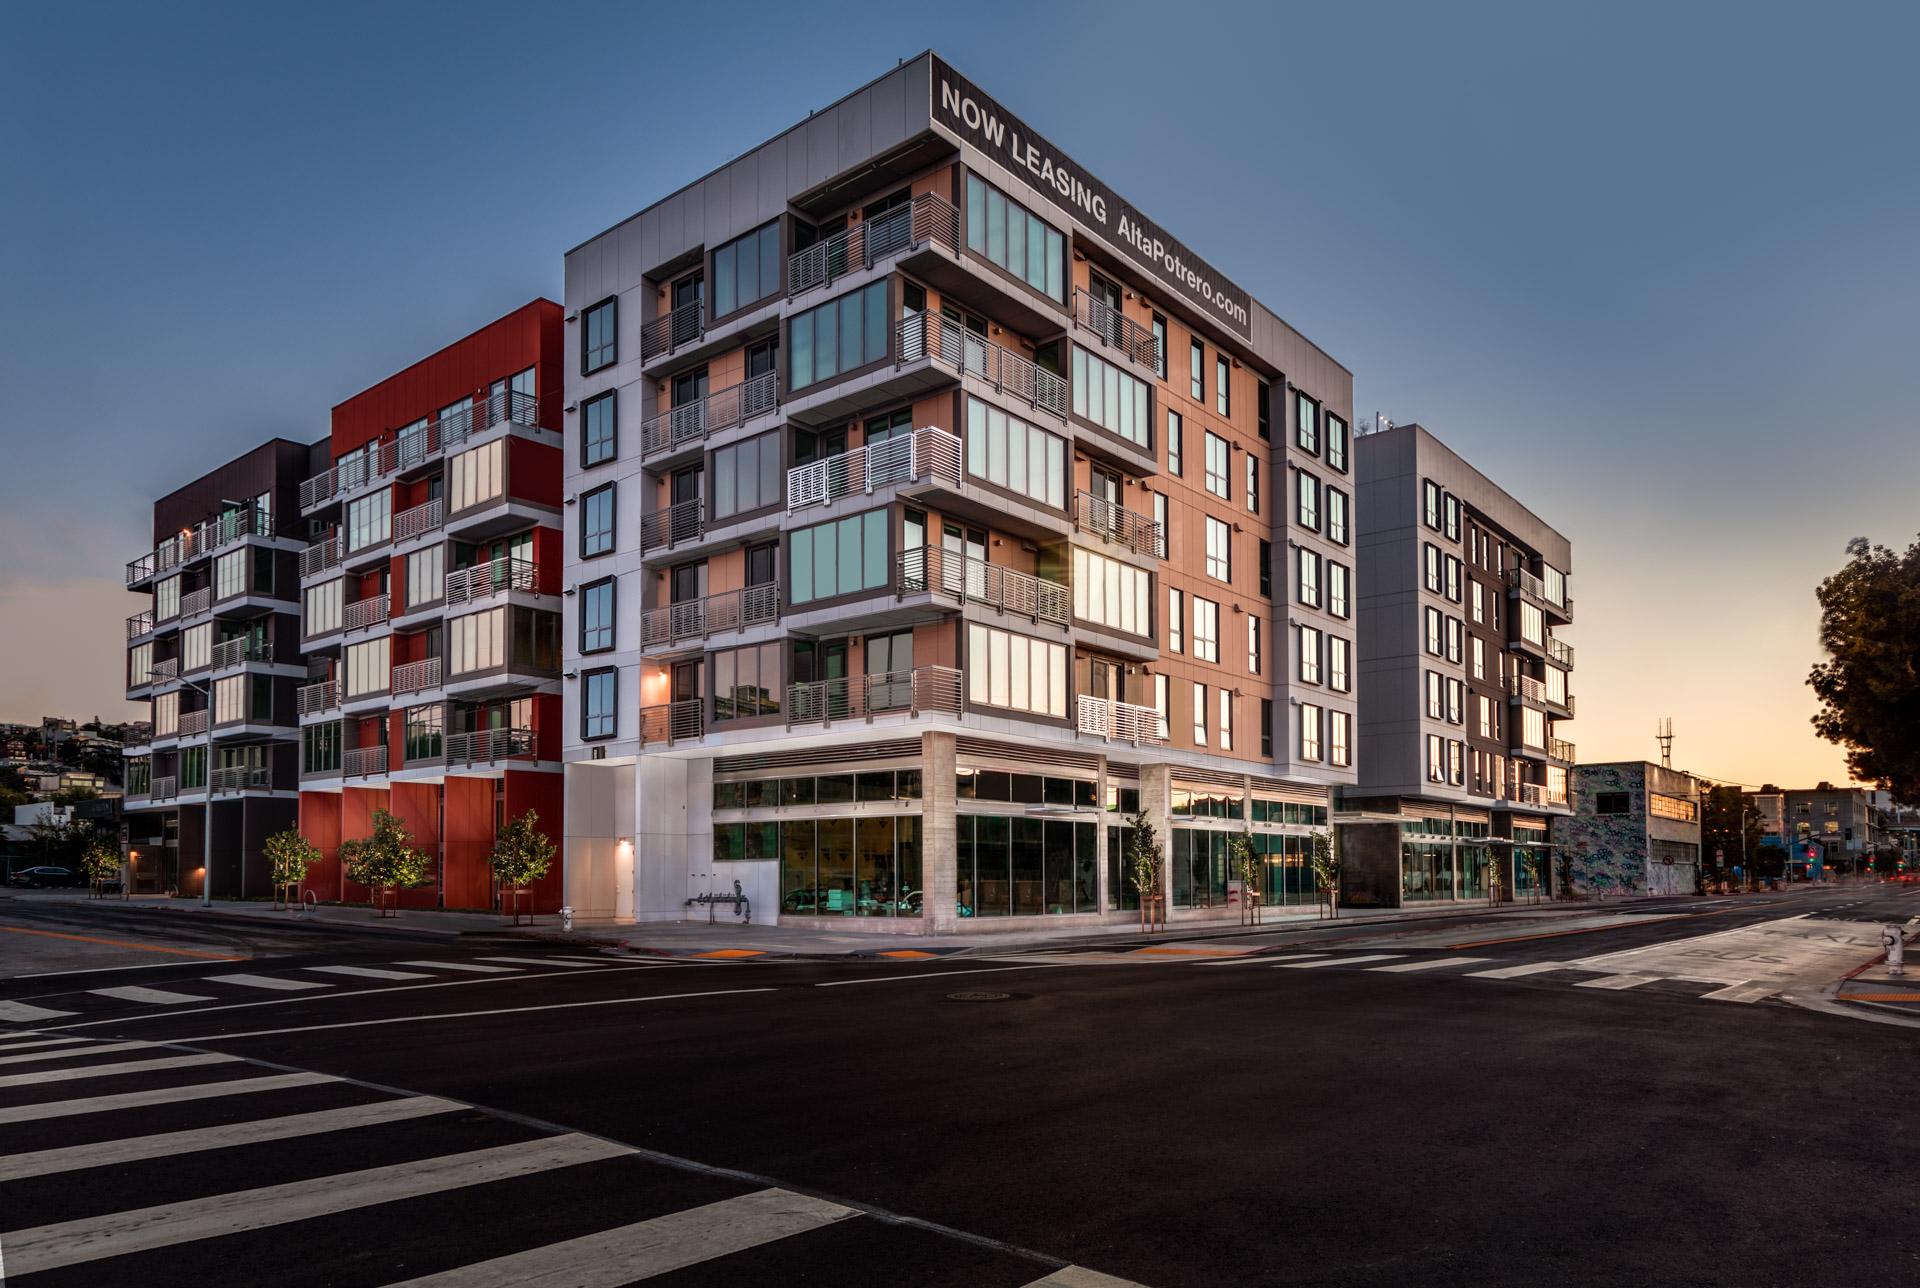 Wood Partners Announces Grand Opening of 172-Unit Alta Potrero Luxury Apartment Community in San Francisco, California